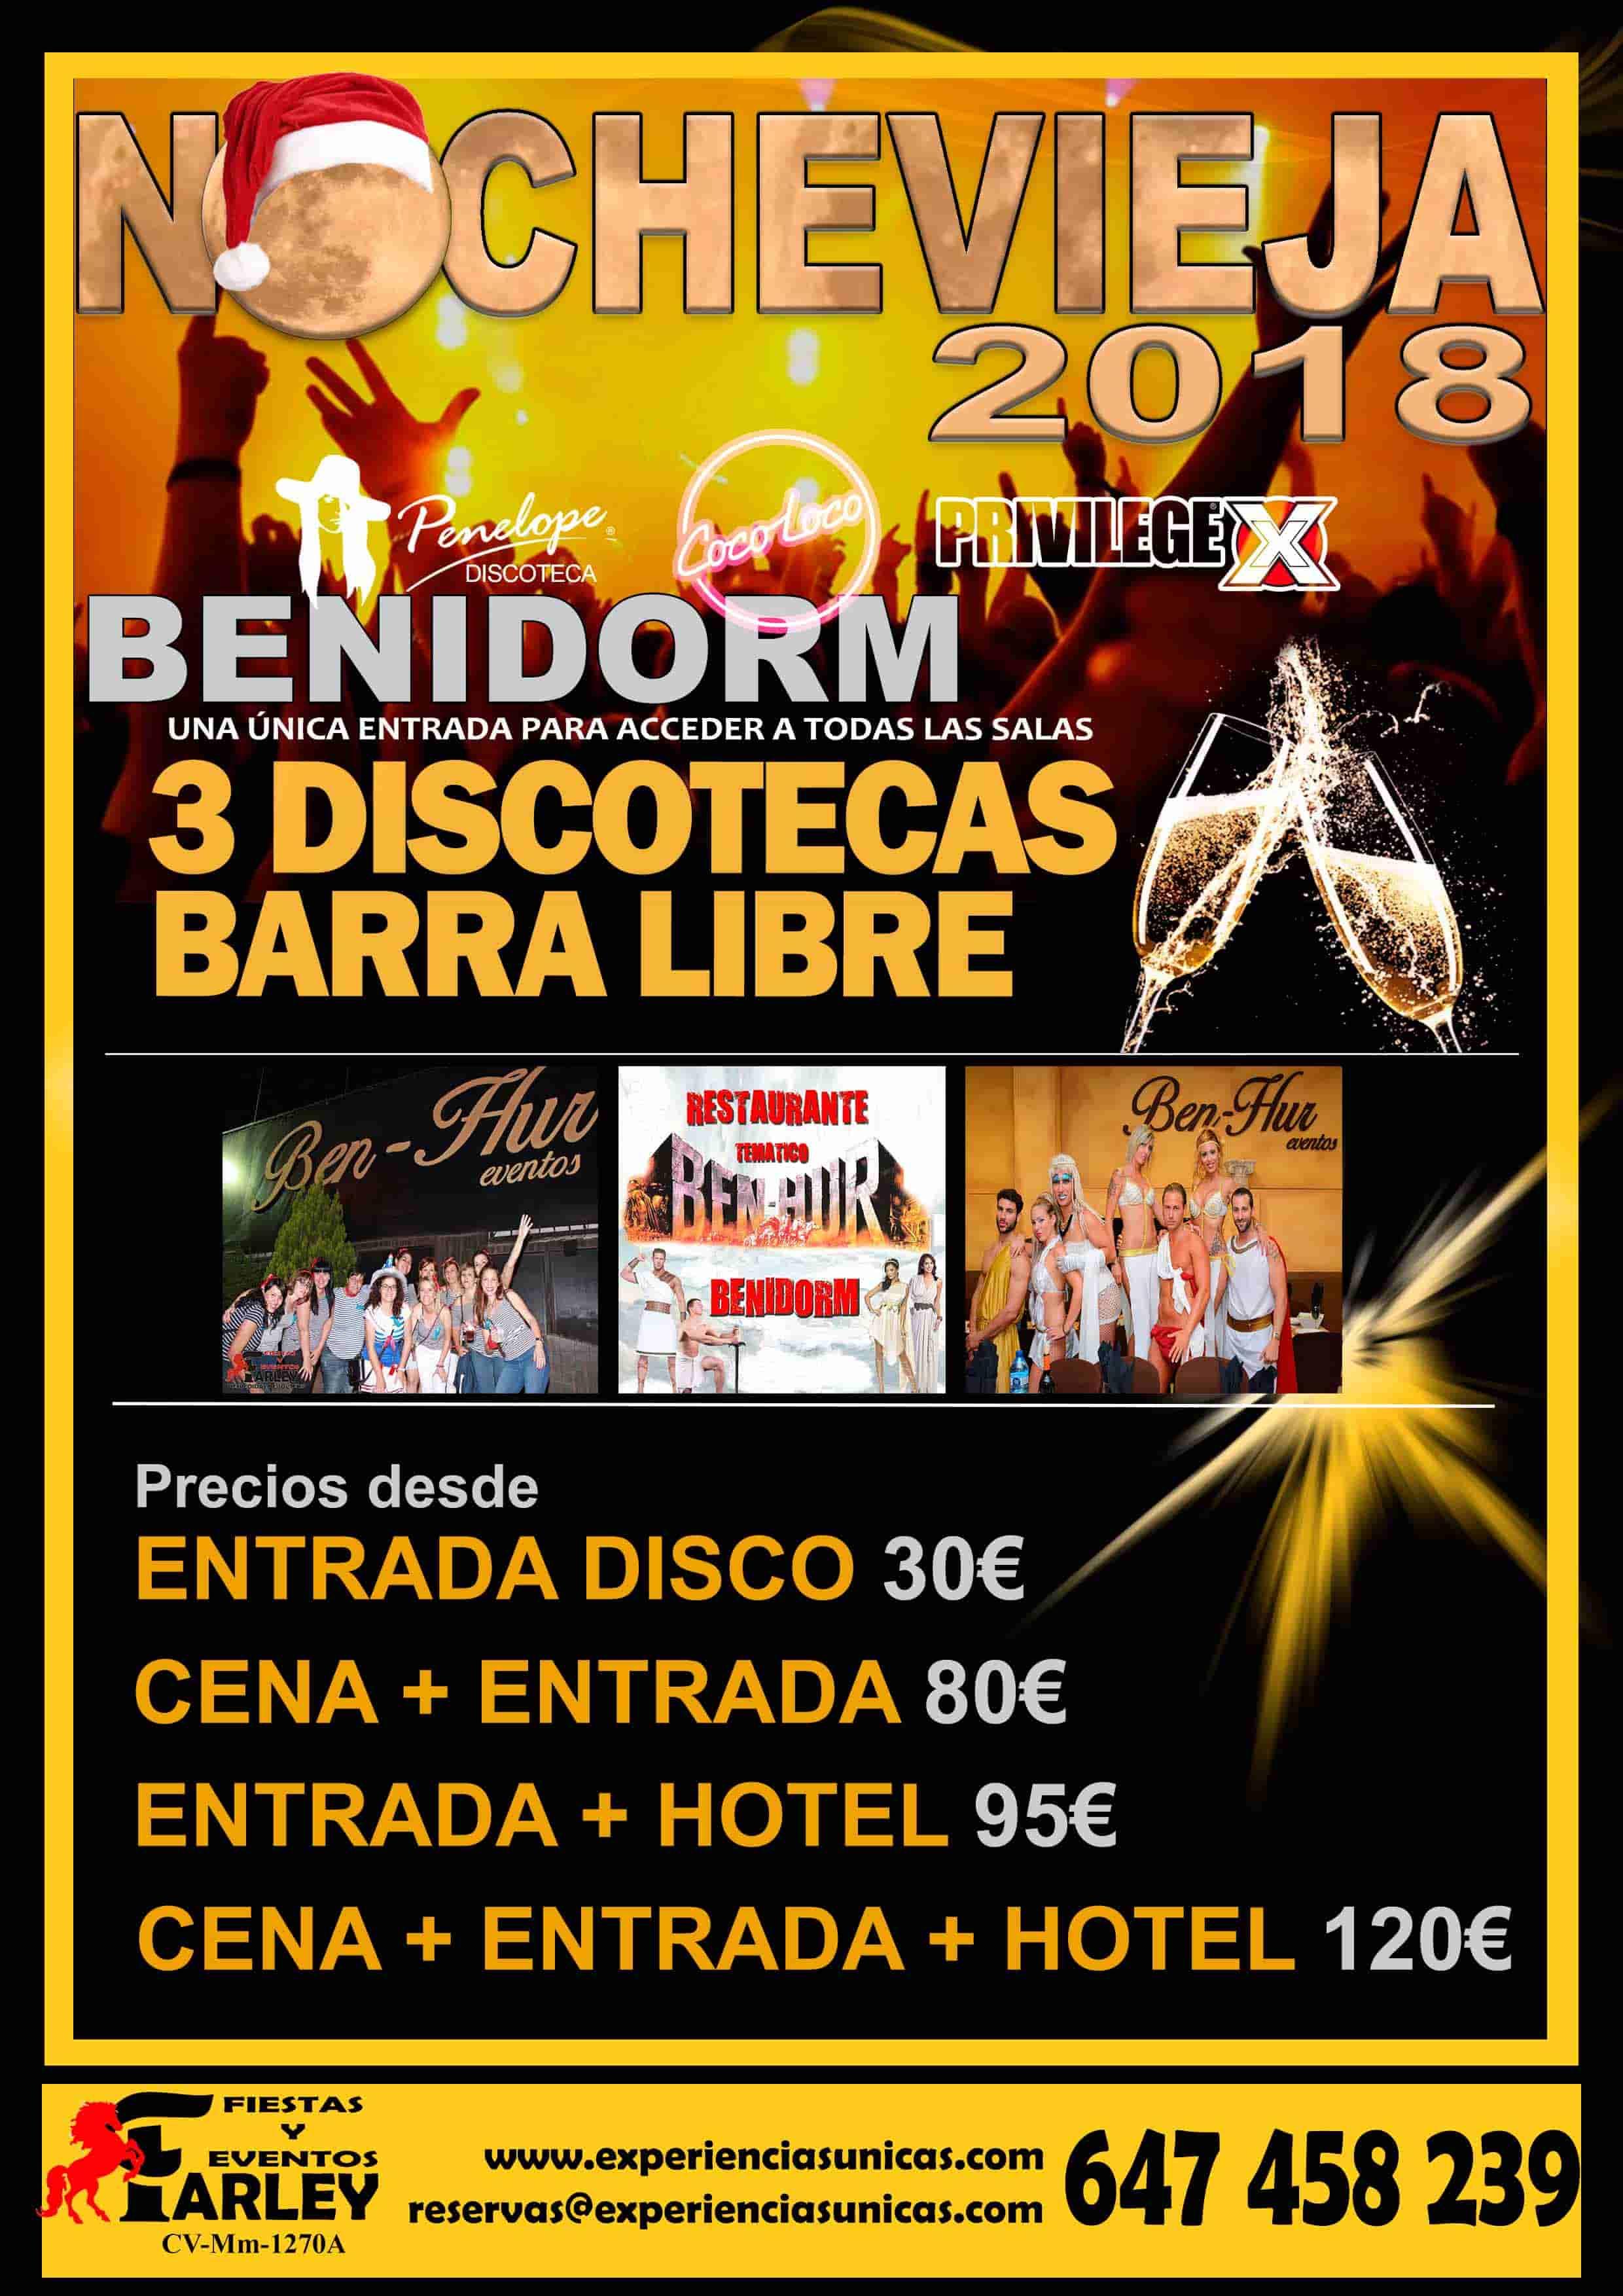 nochevieja Benidorm 2018 Agencia Farley